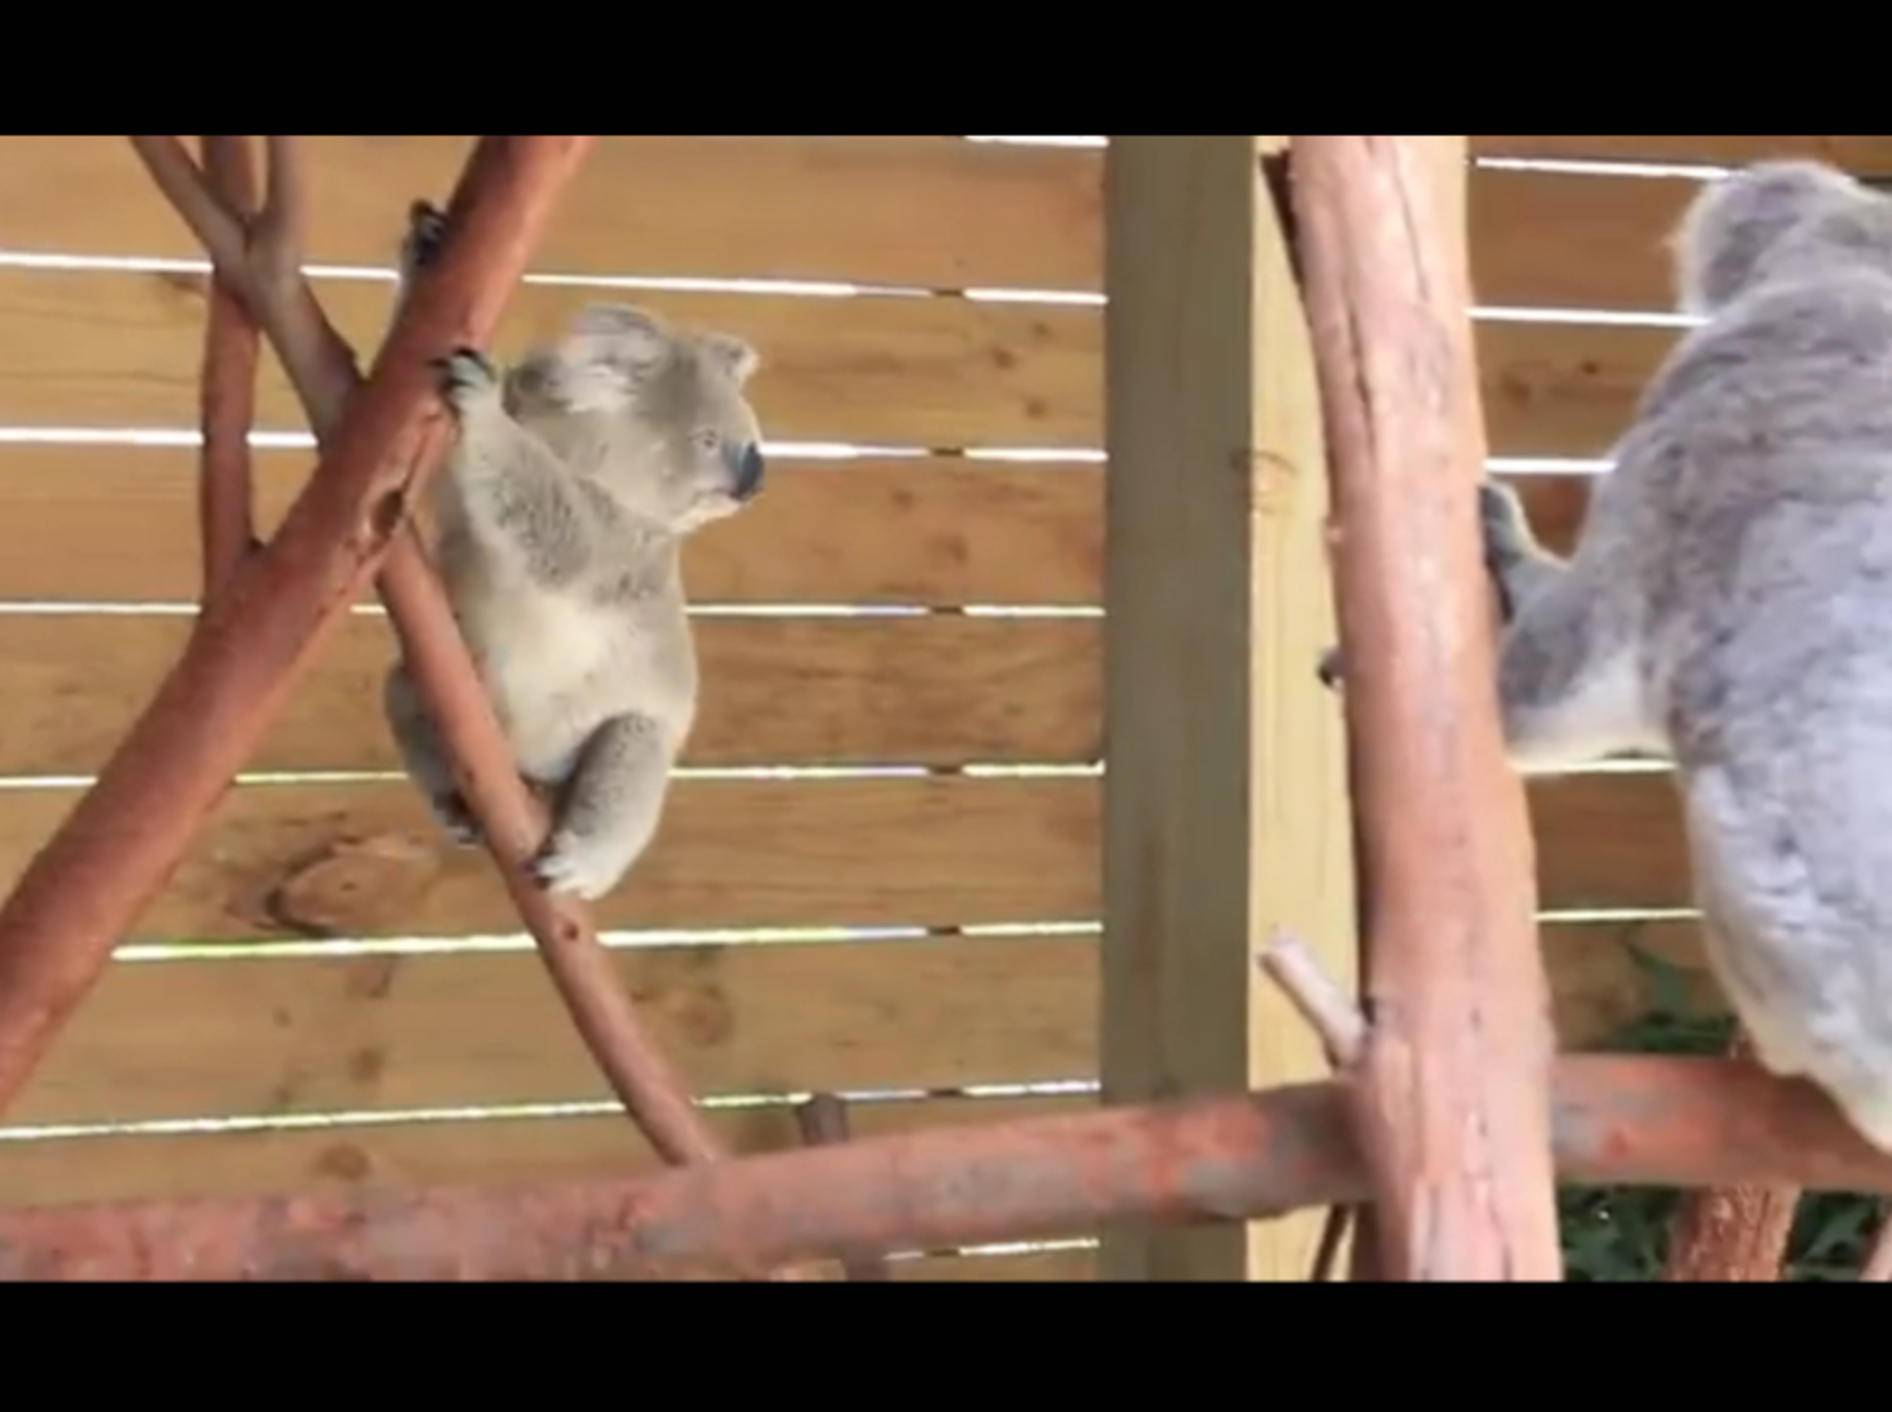 Zwei-Koalas-springen-herum-Symbio Wildlife Park-youtube